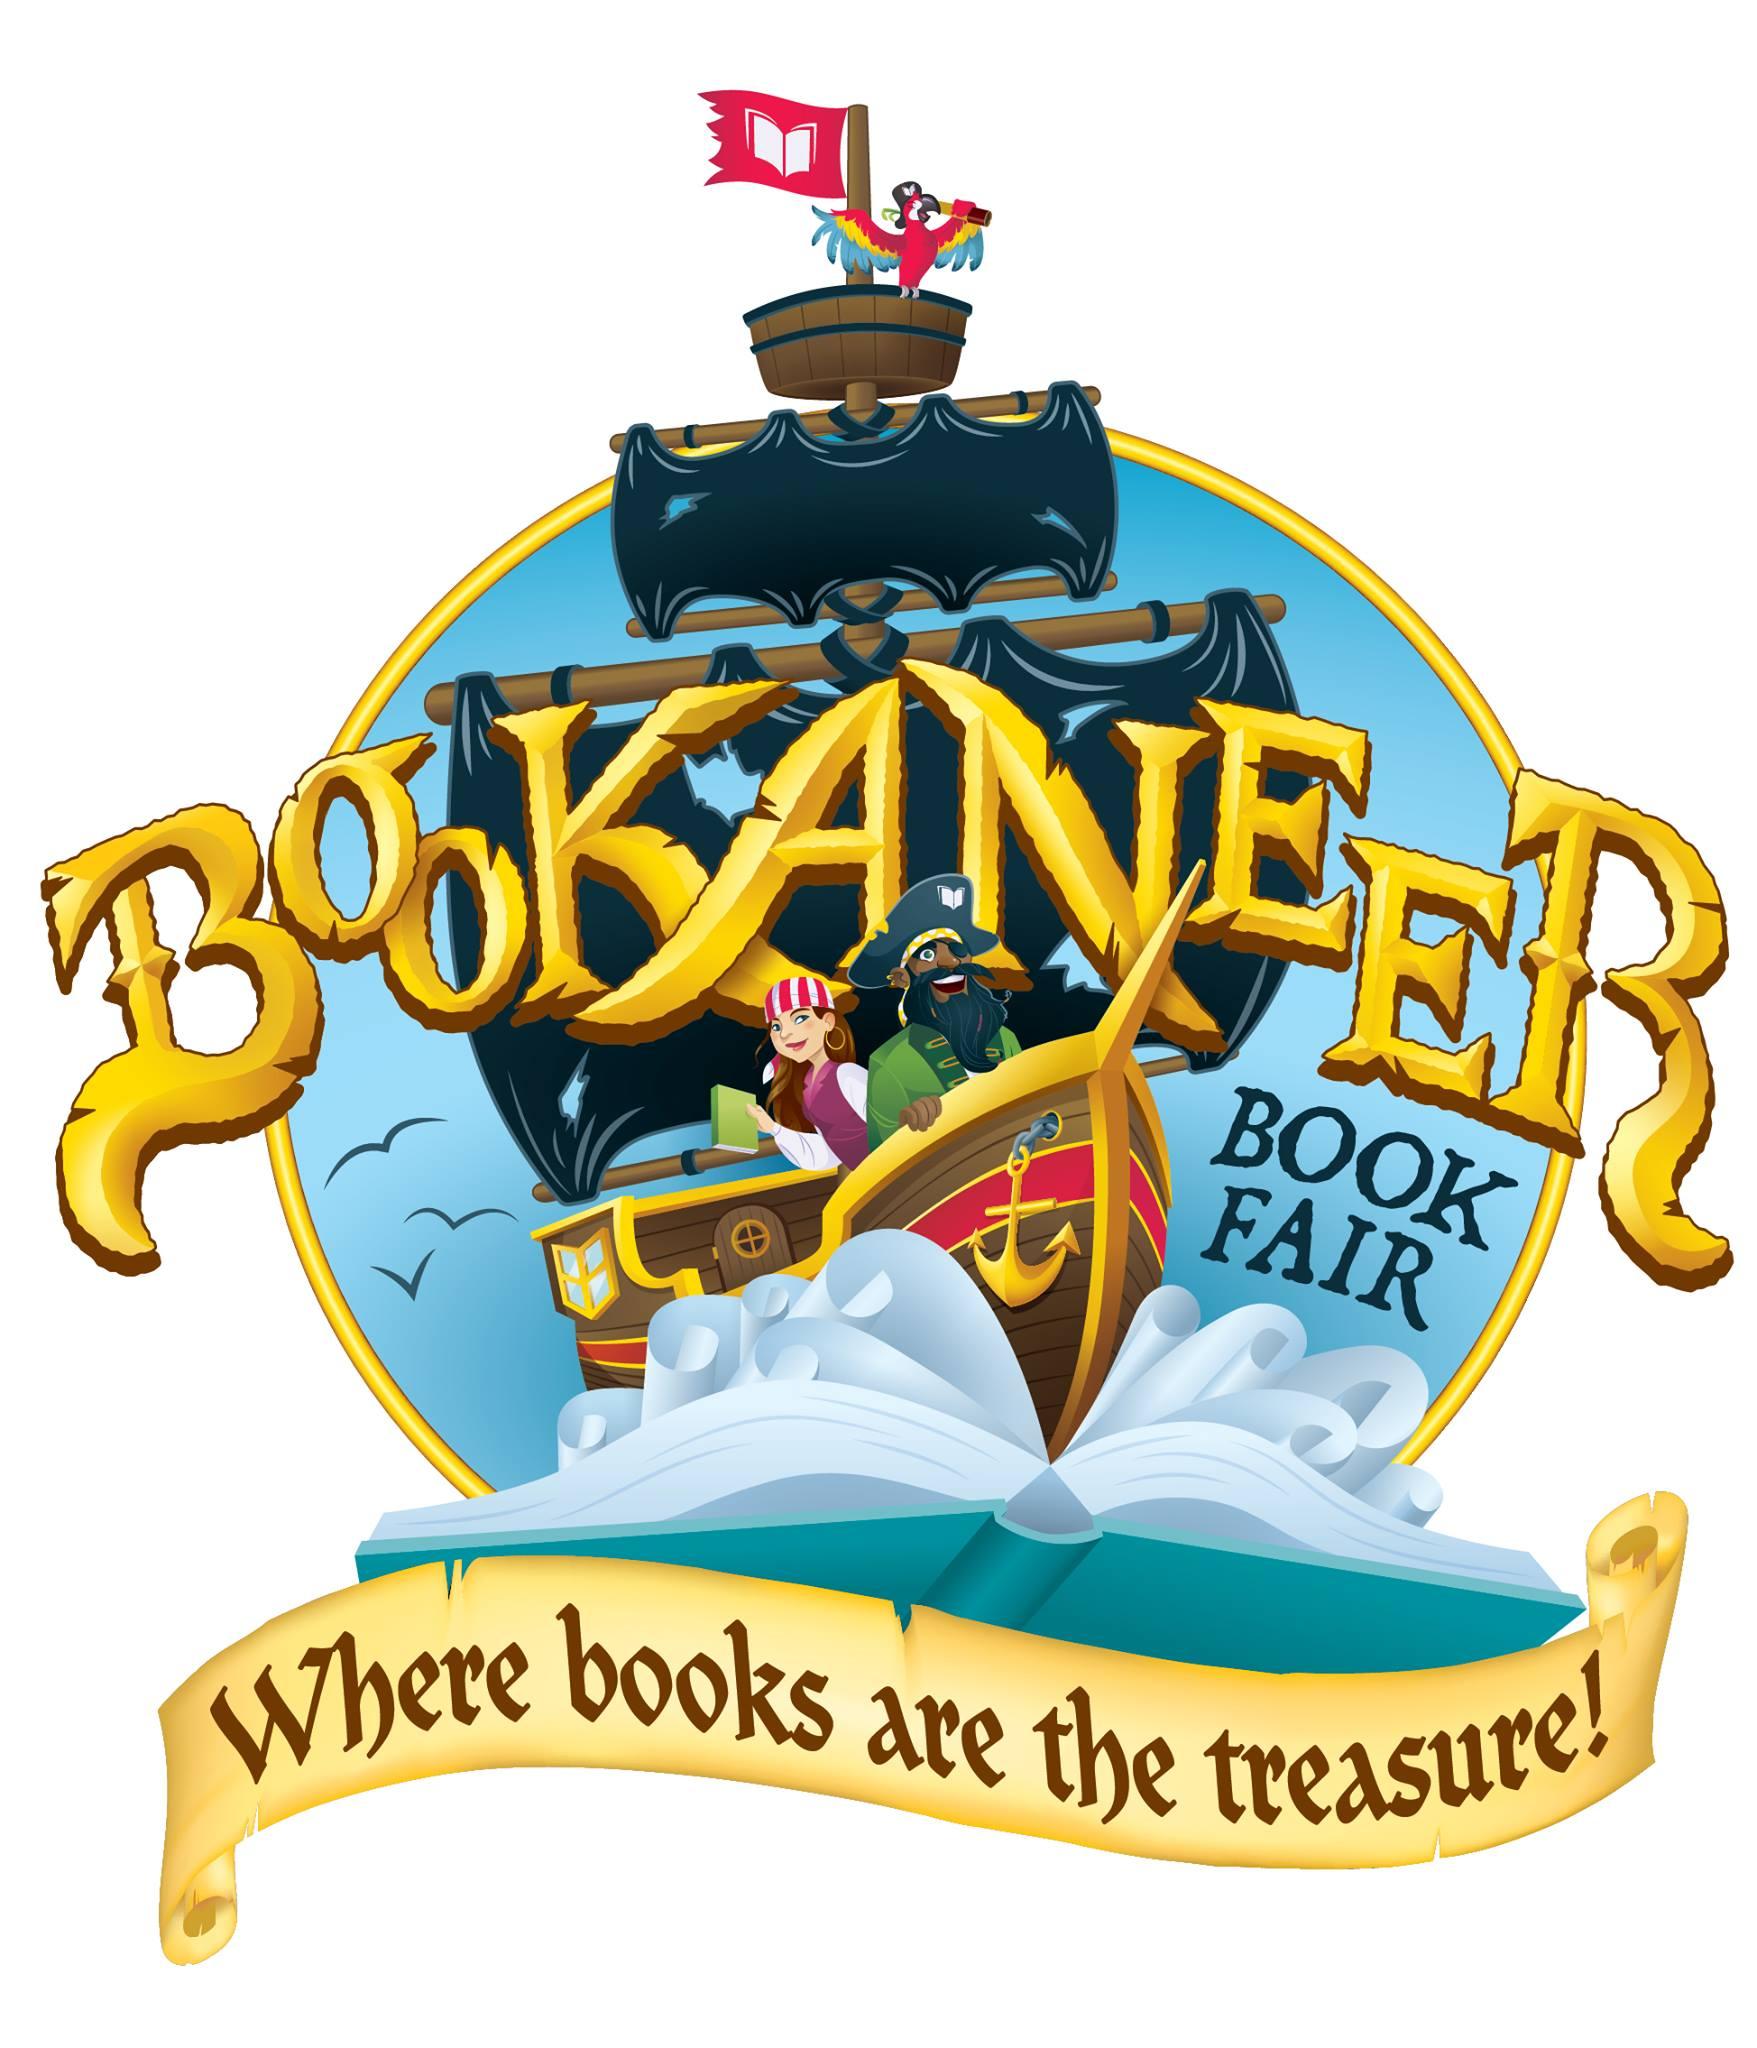 1757x2048 Bookaneer Book Fair